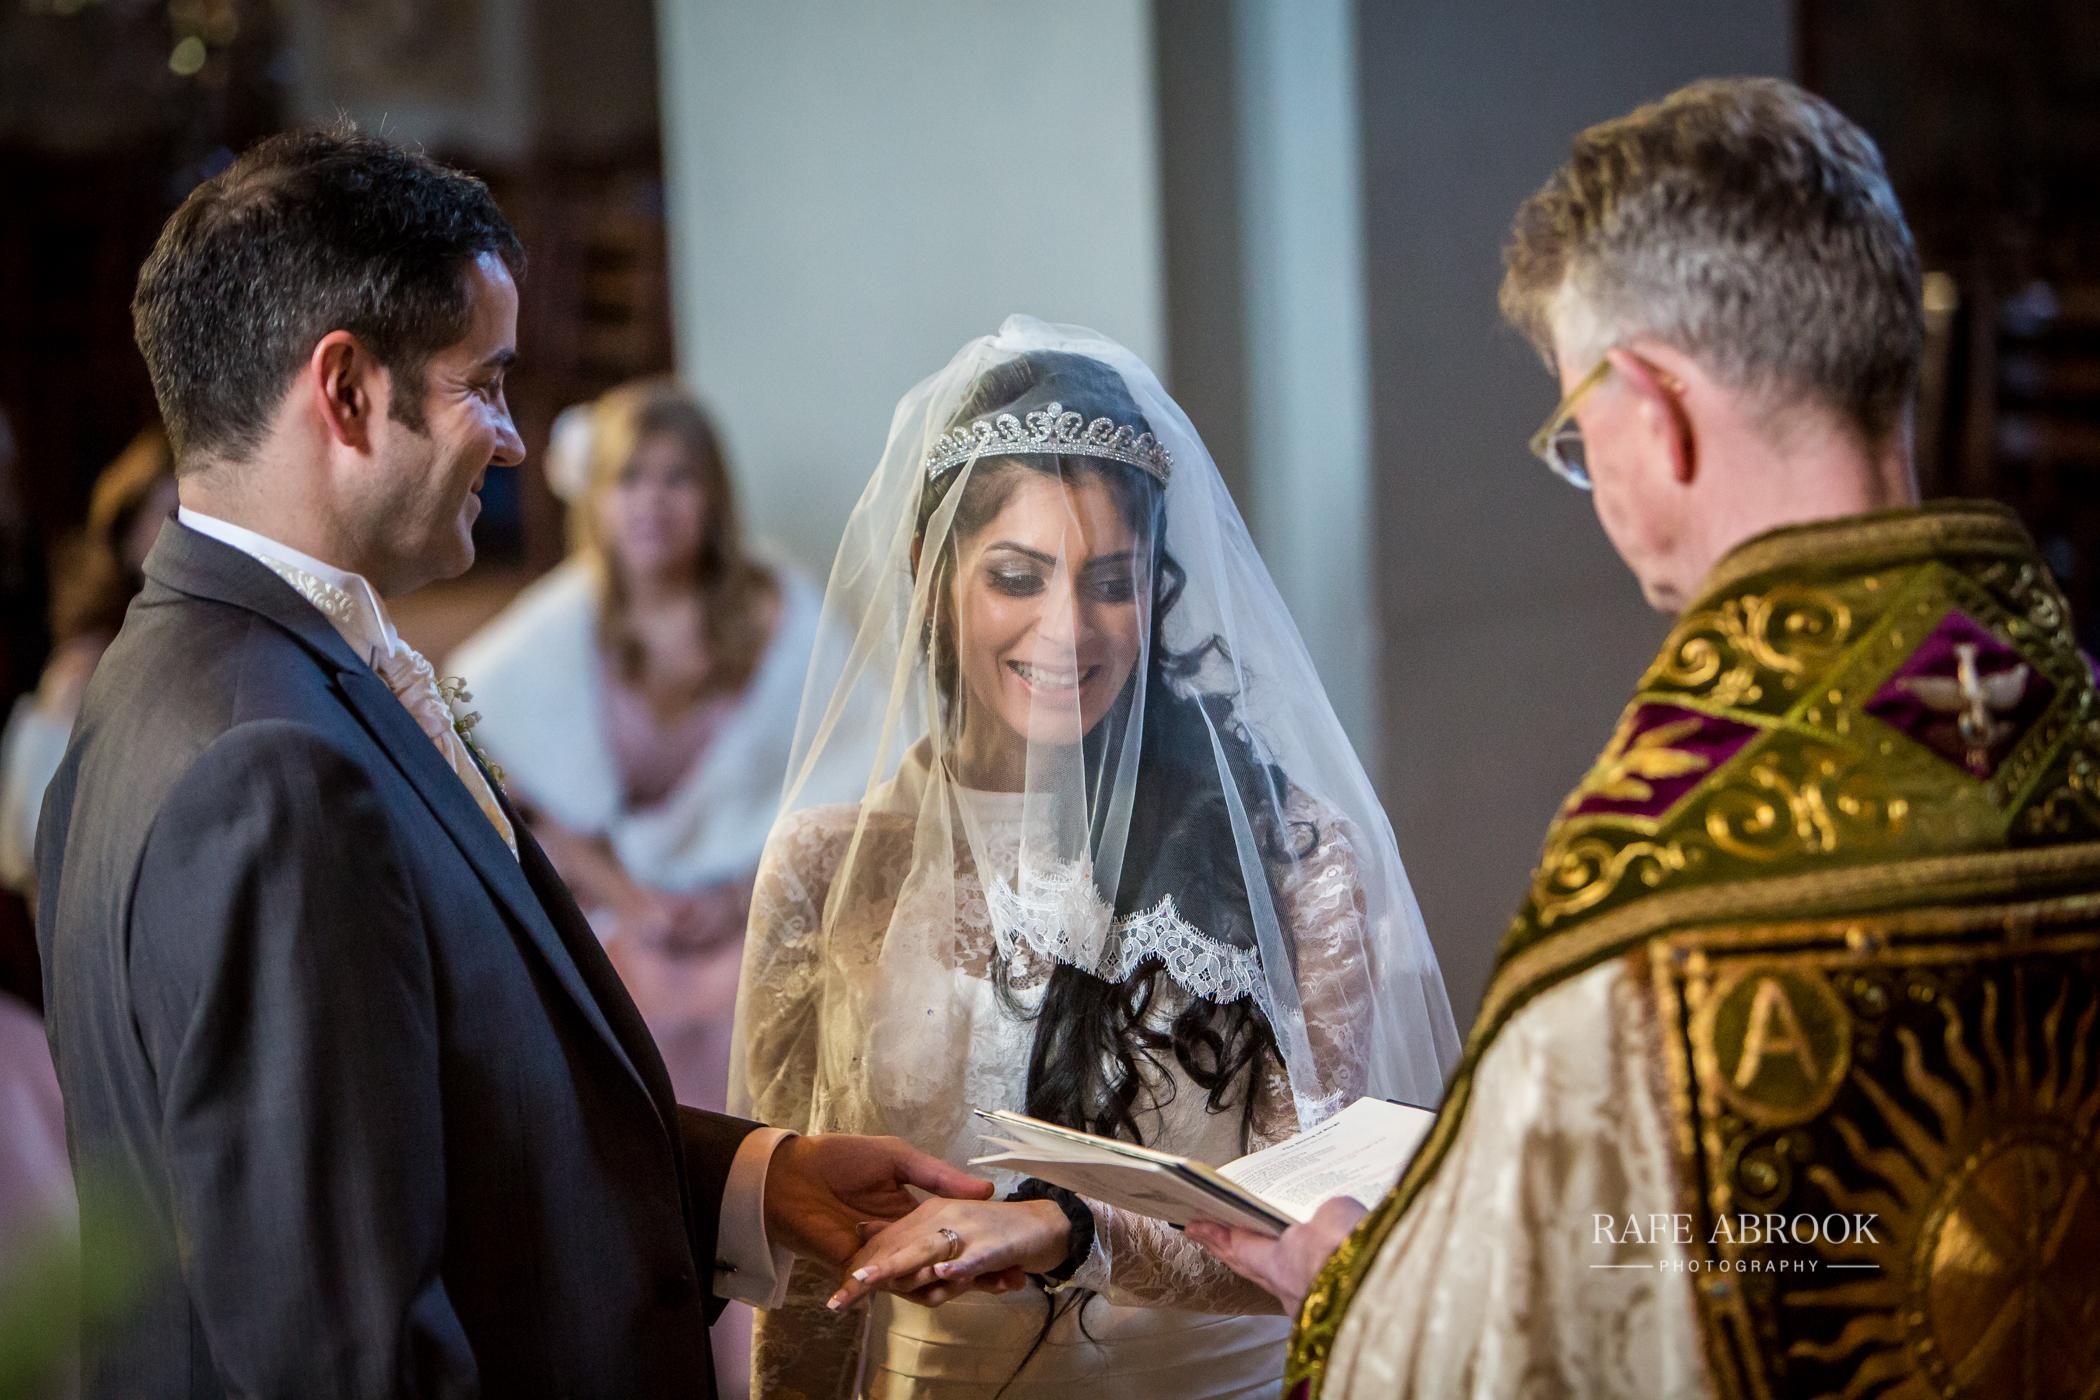 roma & pete wedding hampstead shenley hertfordshire -197.jpg